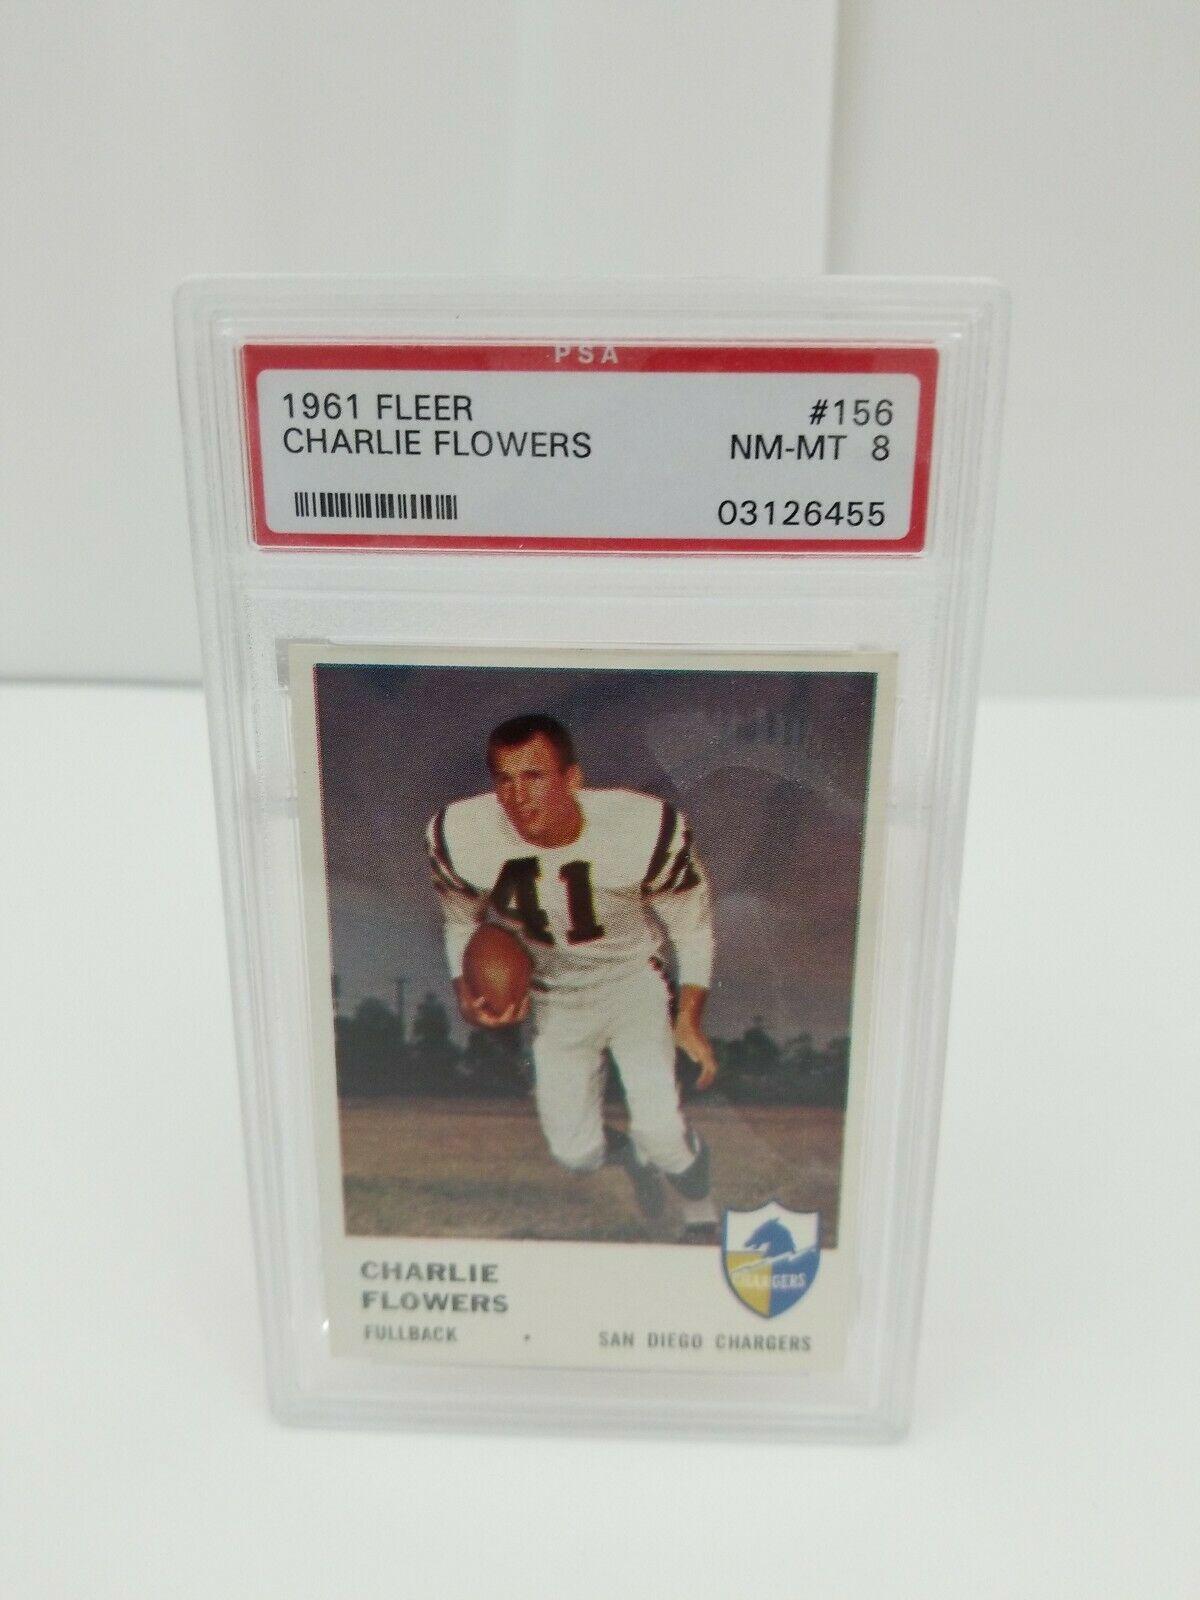 1961 Fleer Football Charlie Flowers #156 PSA 8 NM-MT San Diego Chargers Card